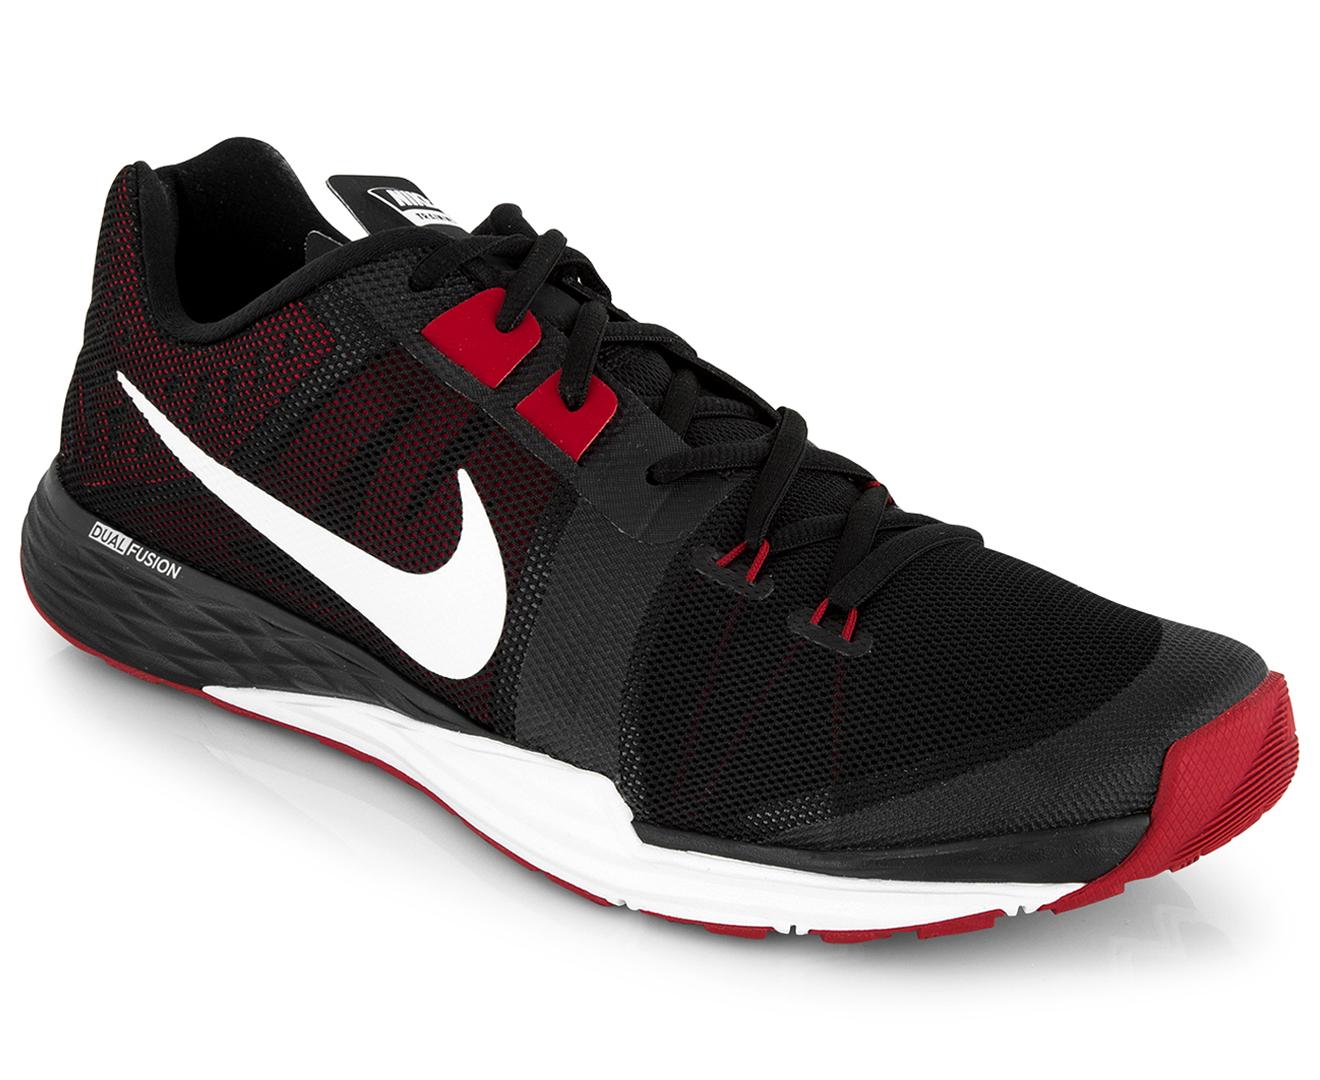 influenza jugador Mucama  Nike Men's Train Prime Iron DF Shoe - Black/White-Tough Red | Catch.com.au